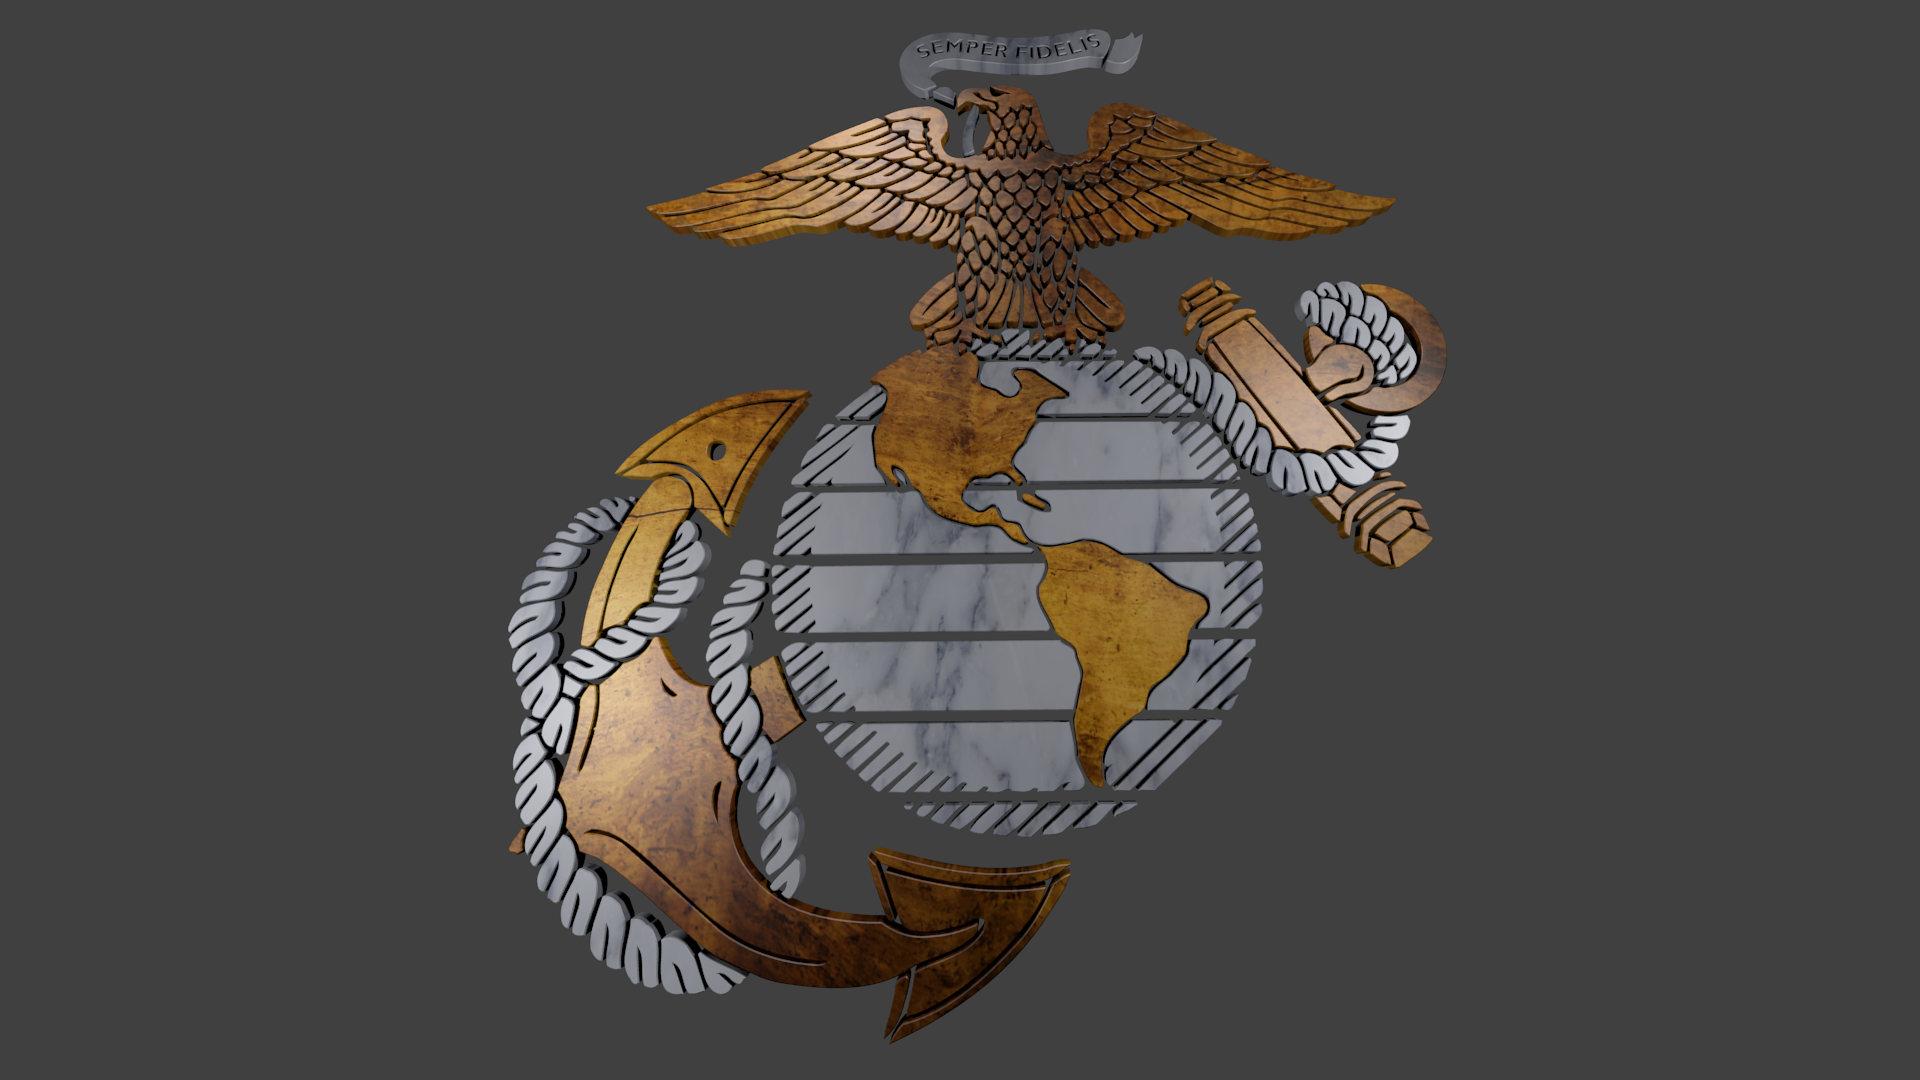 USMC Logo Wallpaper 1920x1080